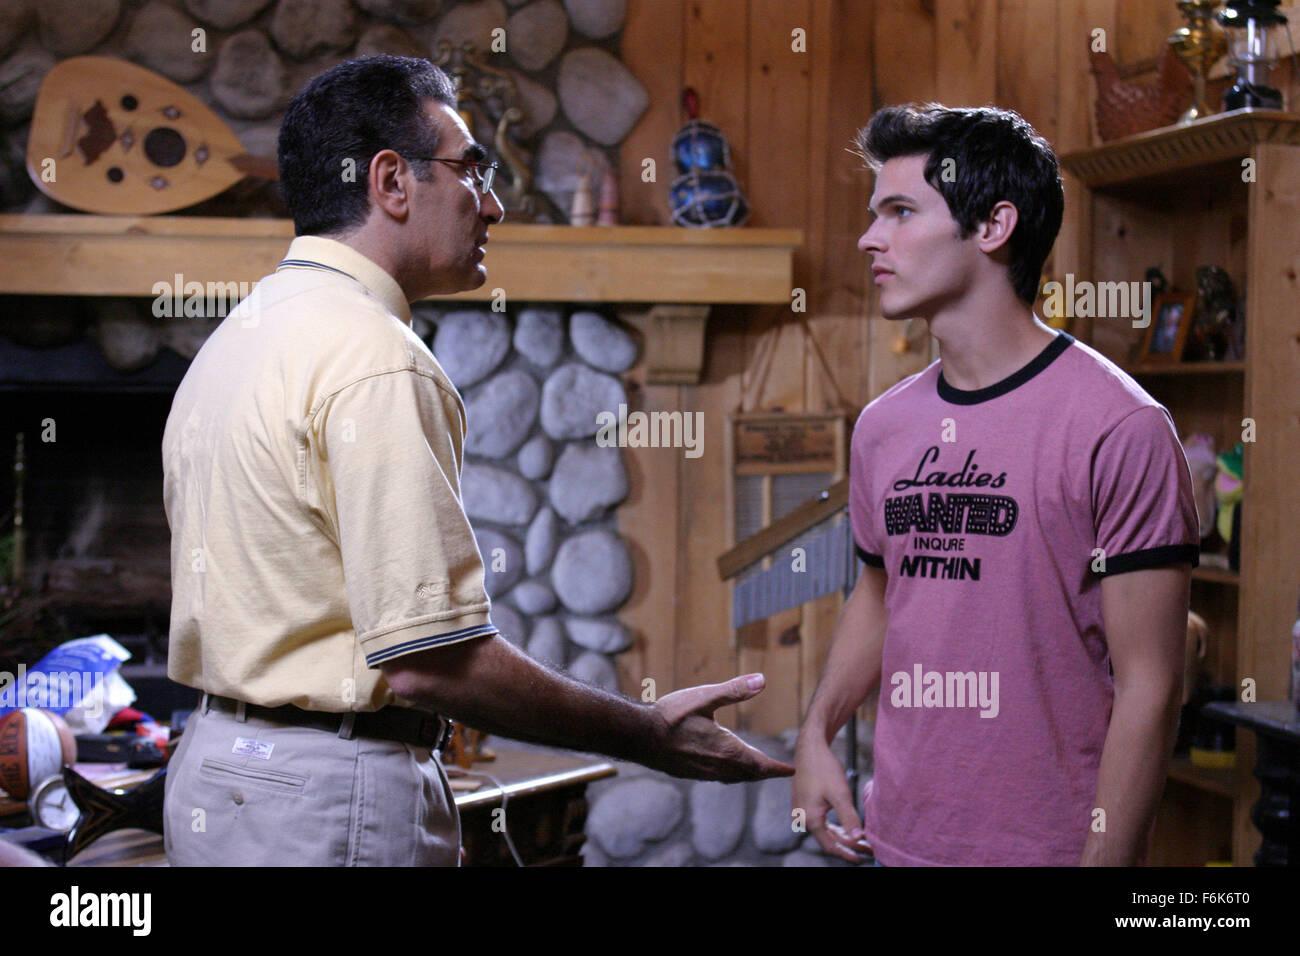 American Pie Band Camp Scene released: dec 26, 2005. movie title: american pie presents